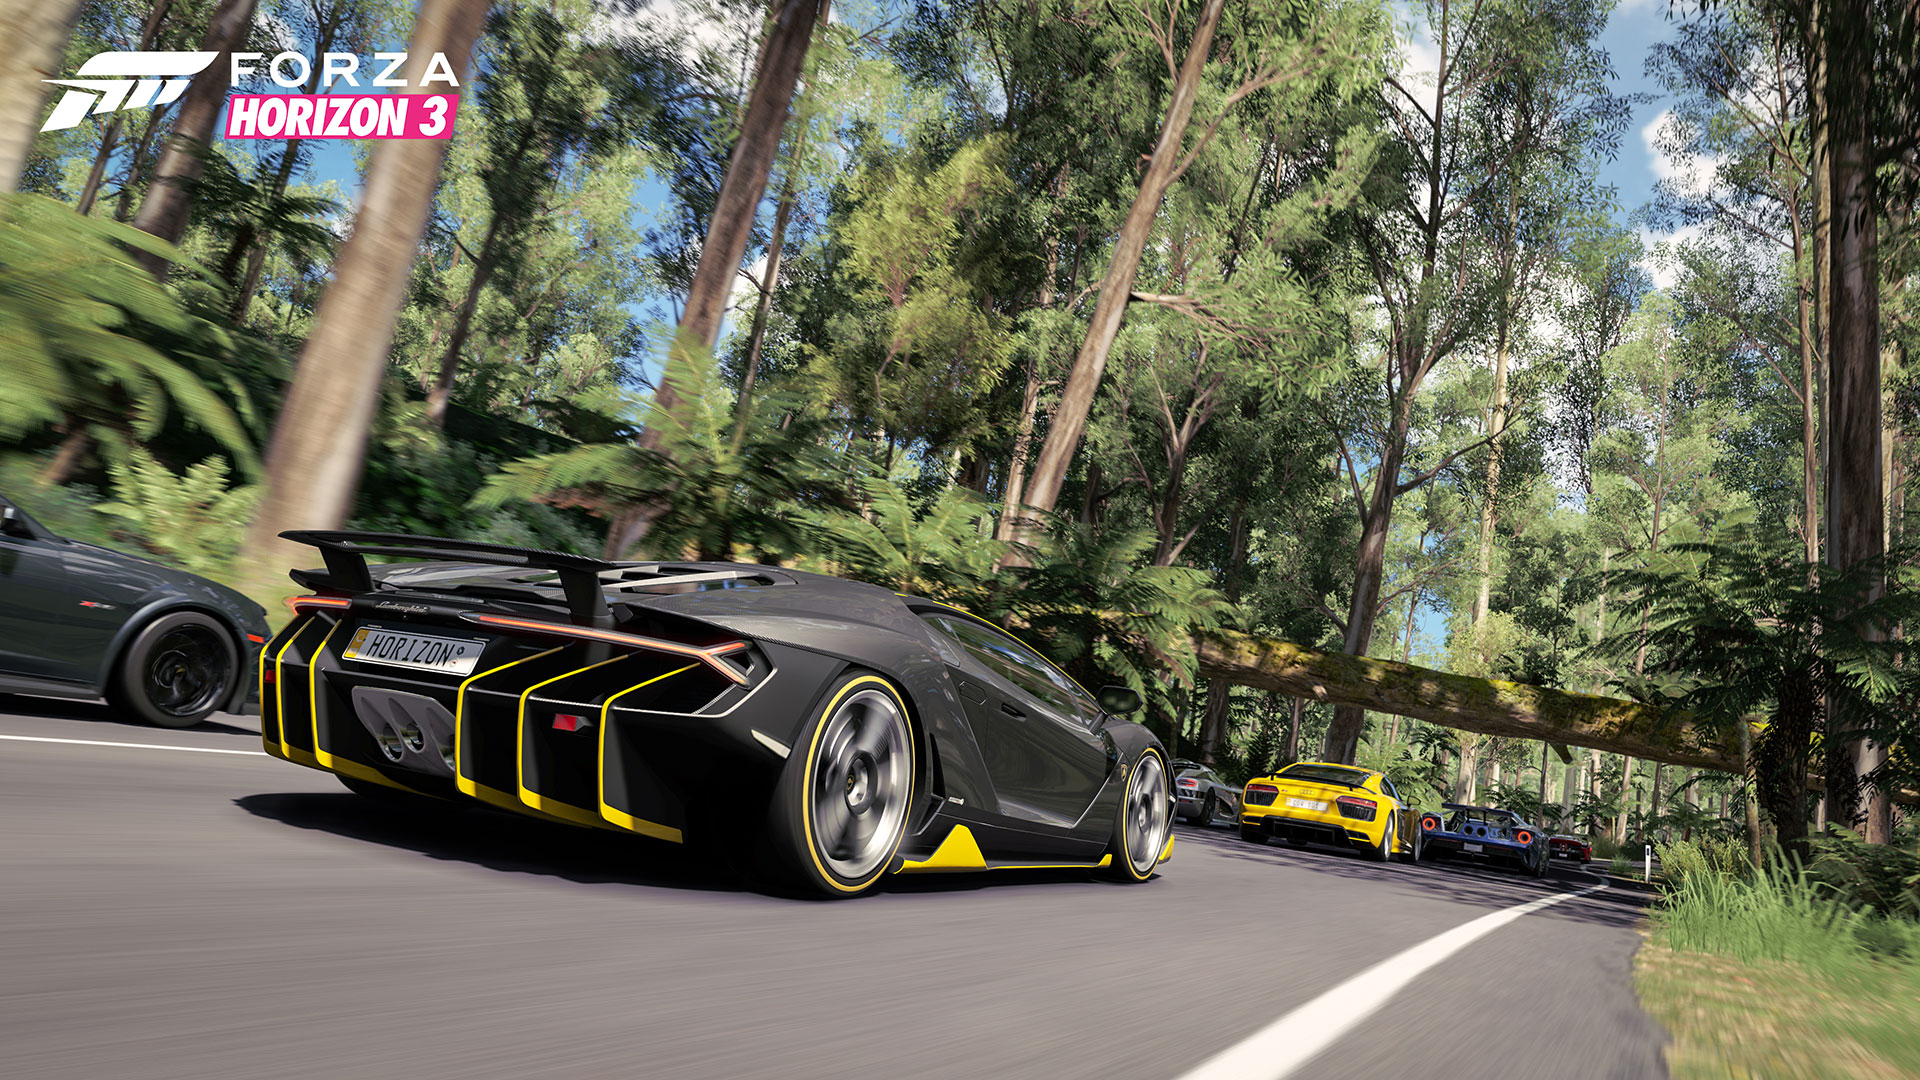 Forza Motorsport - Forza Horizon 3 Windows 10 Demo